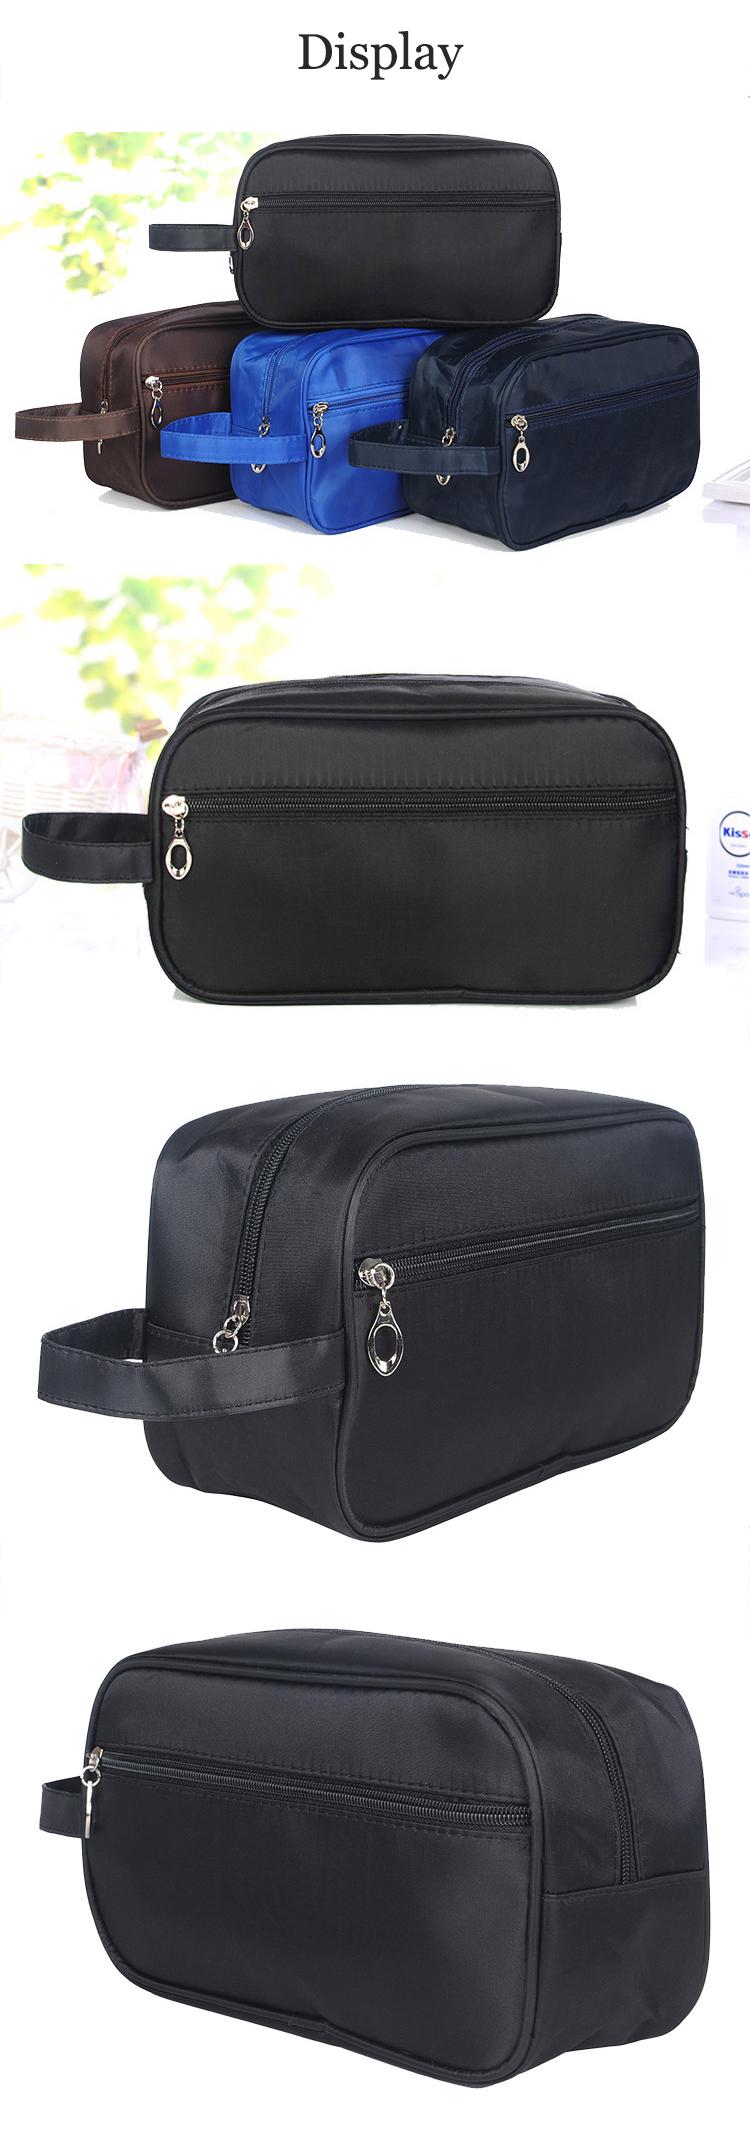 Honana HN-TB12 Waterproof Travel Toiletry Bag Large Nylon Shaving Cosmetics Kit Bag